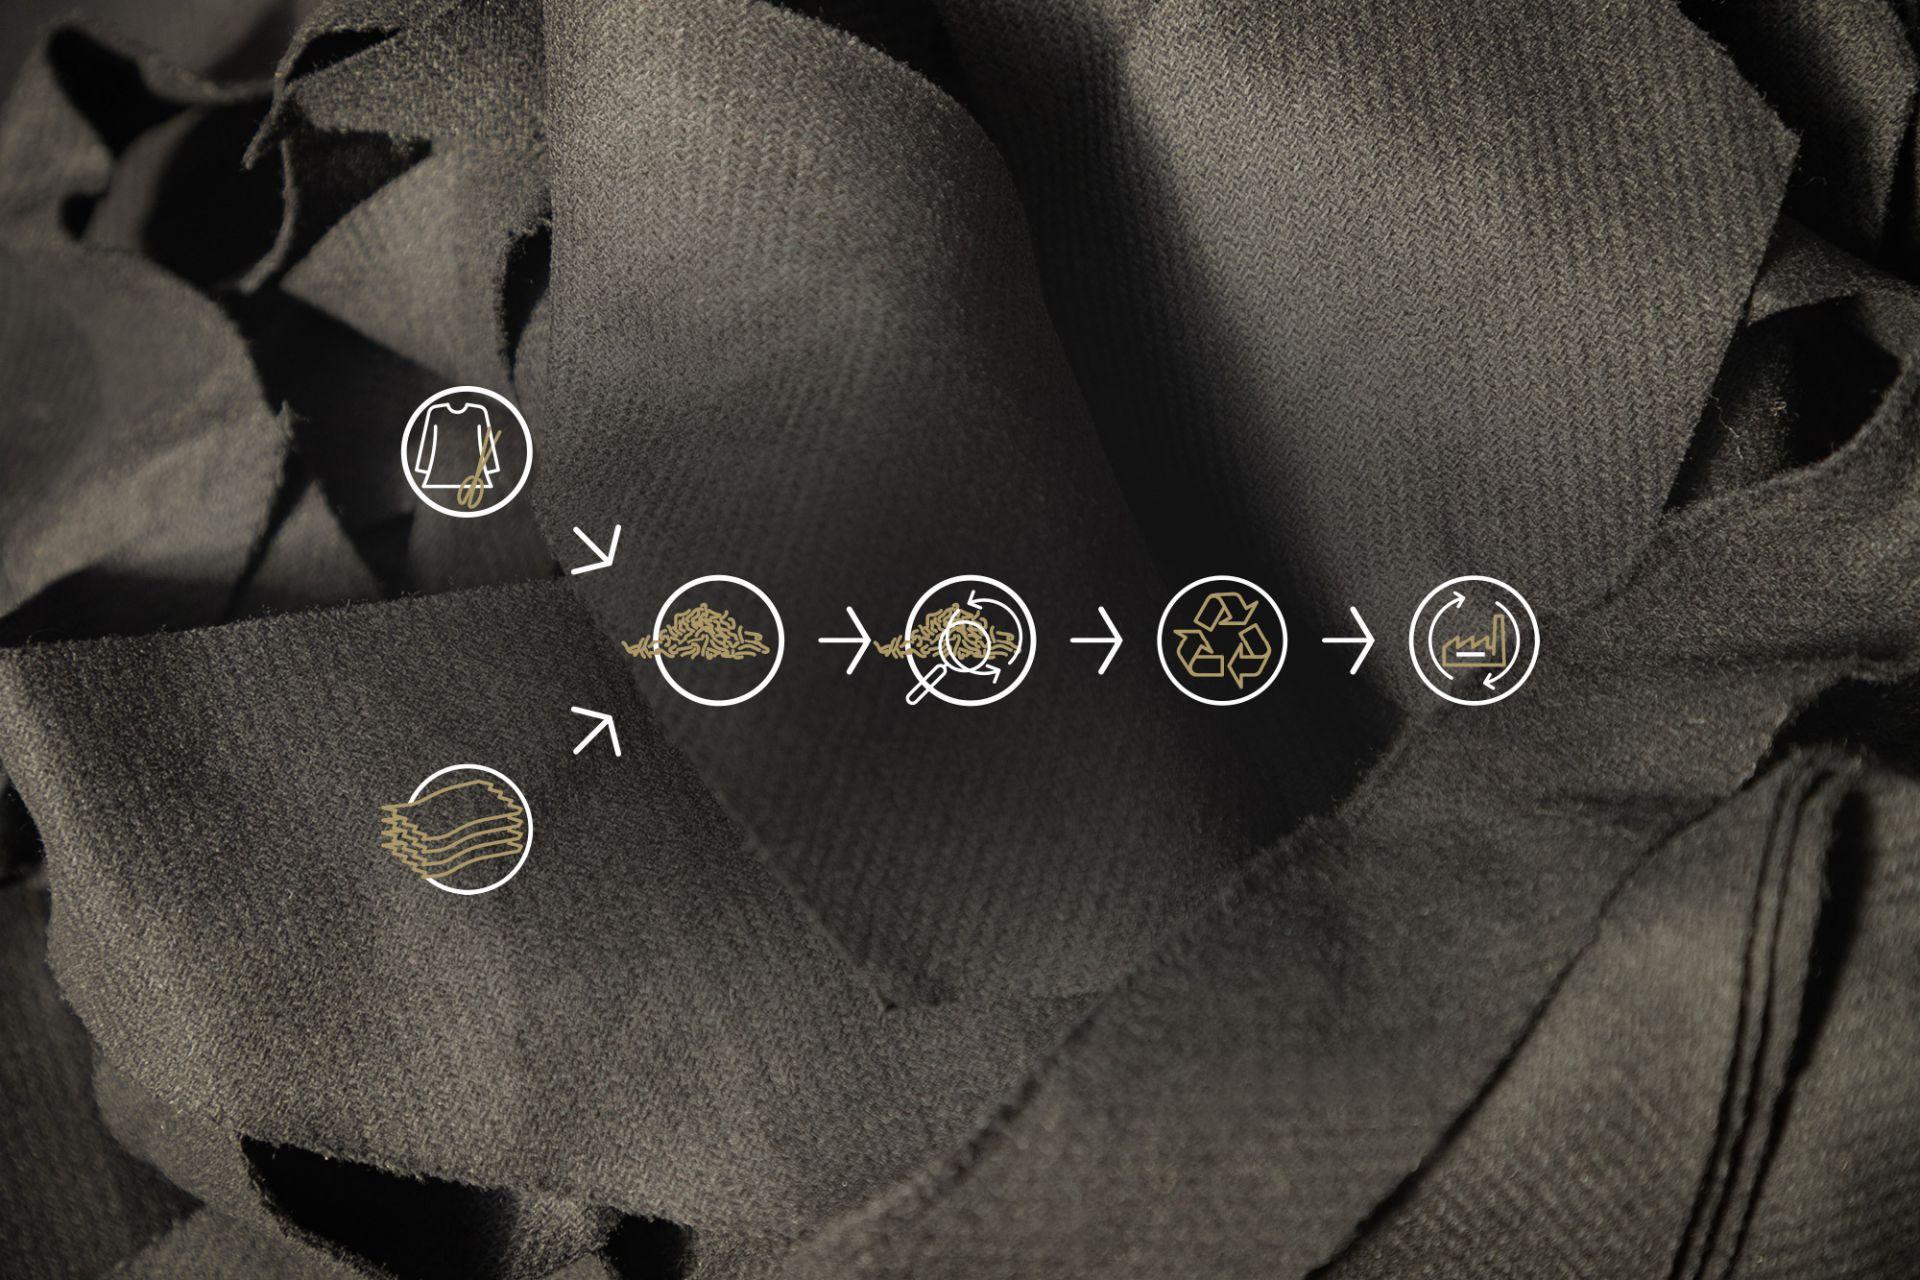 Composer image